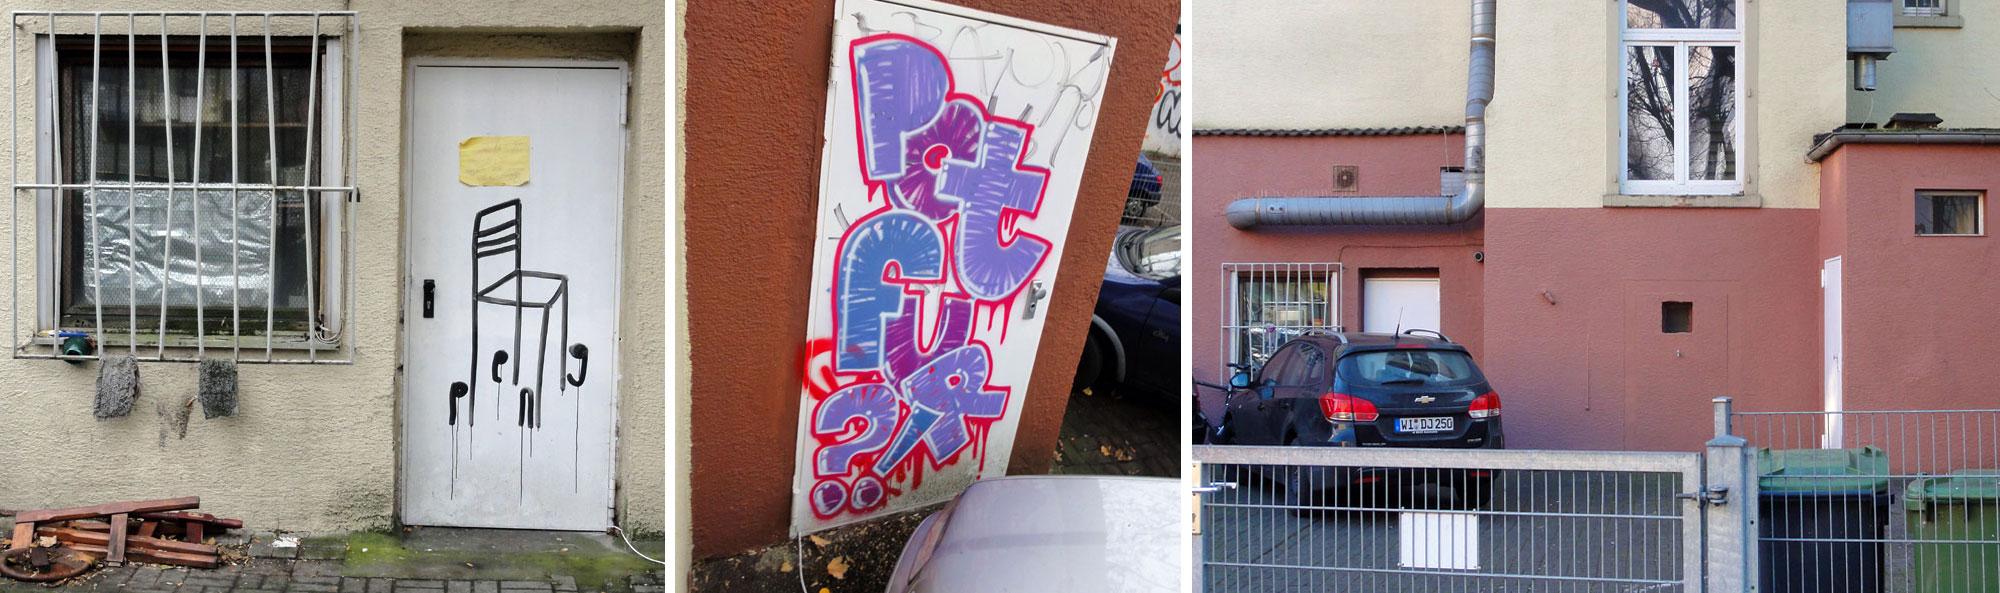 Graffiti-Saubermachwochen in Frankfurt